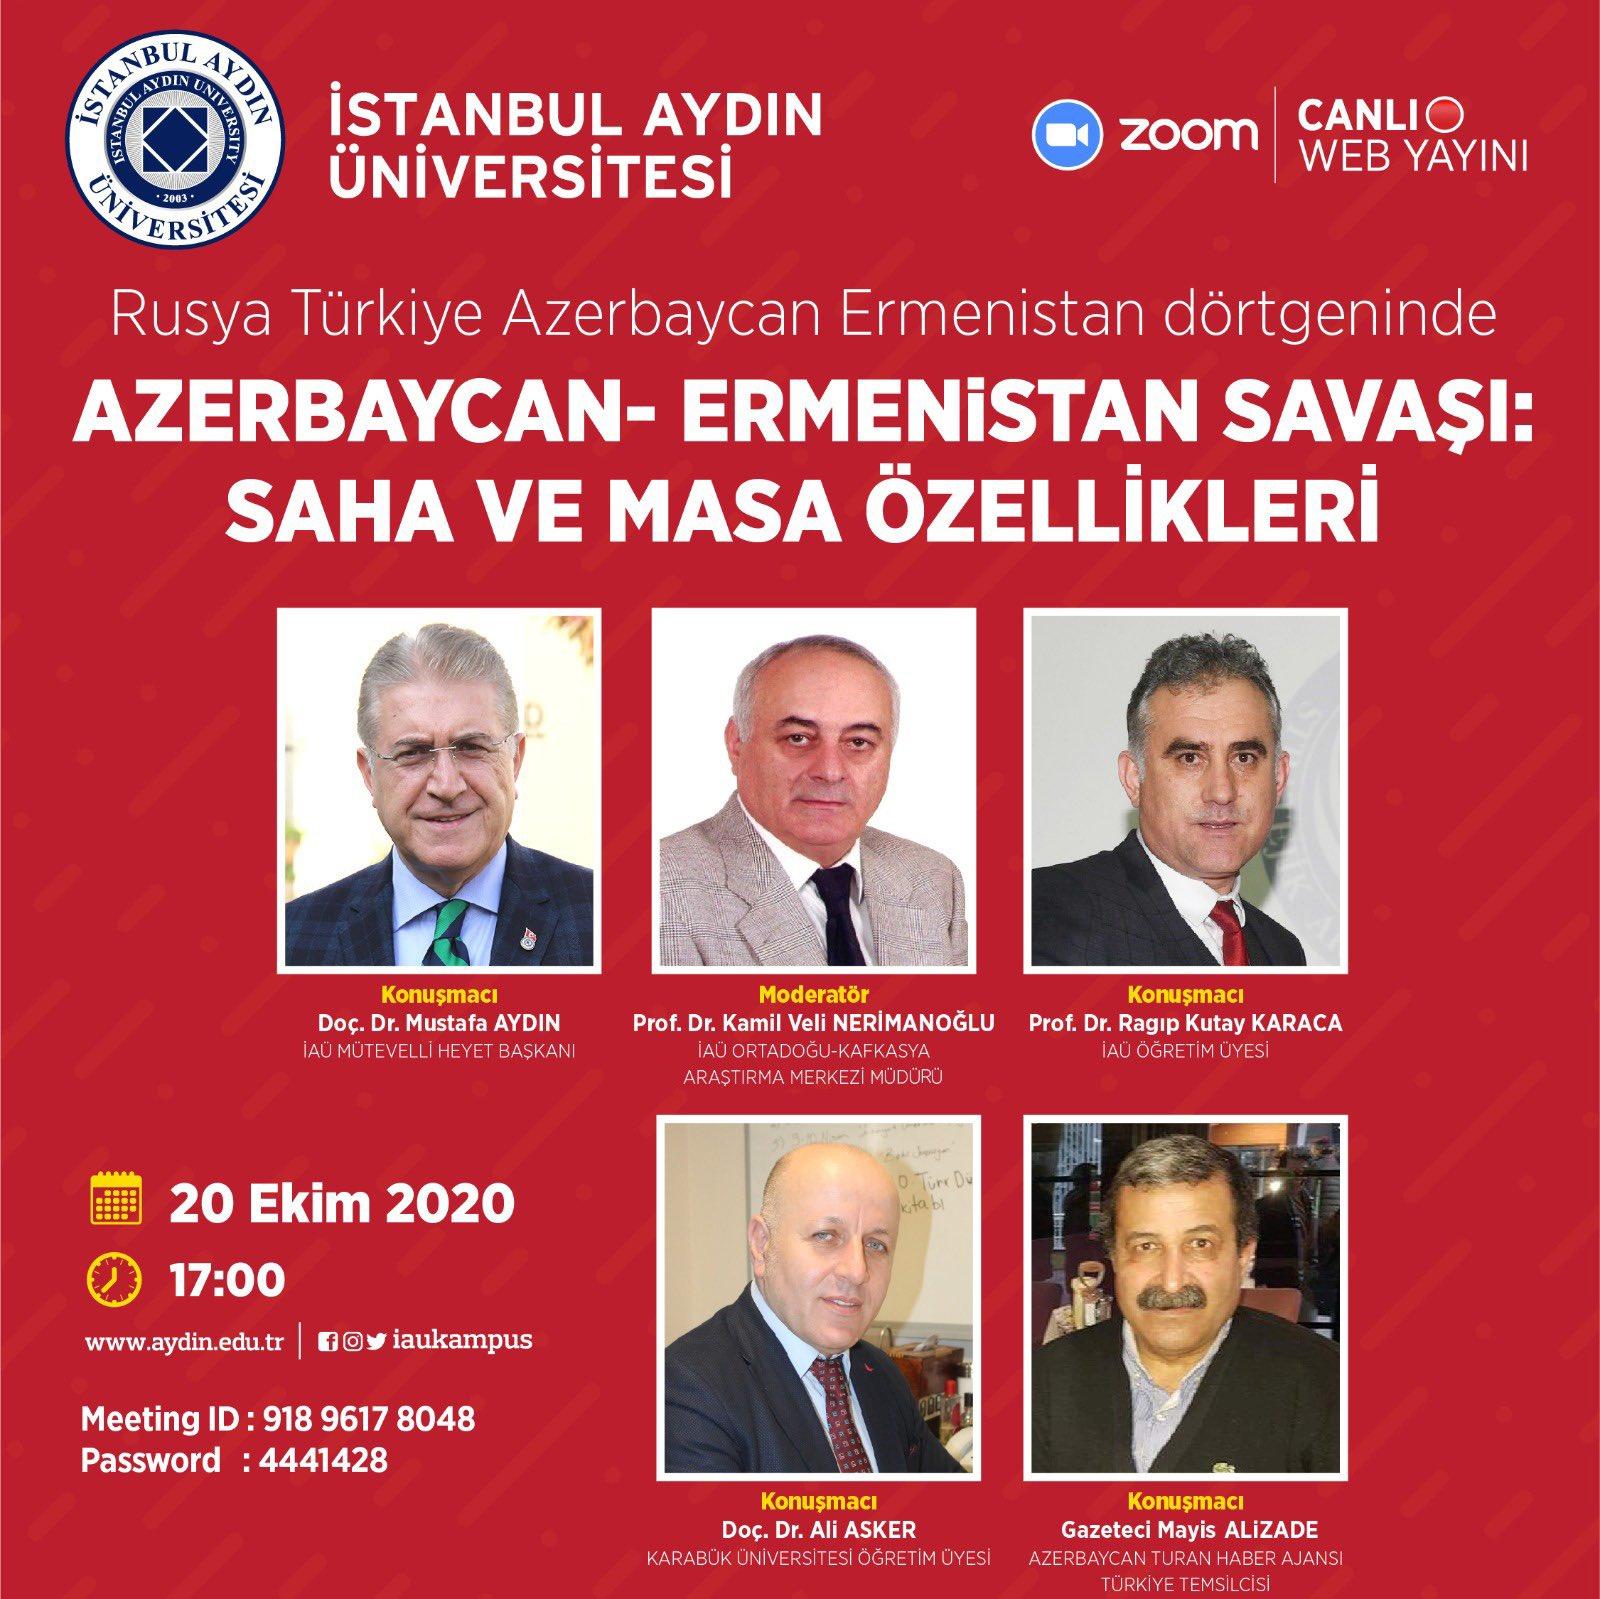 https://mustafaaydin.com/wp-content/uploads/2020/10/azerbaycan.jpg